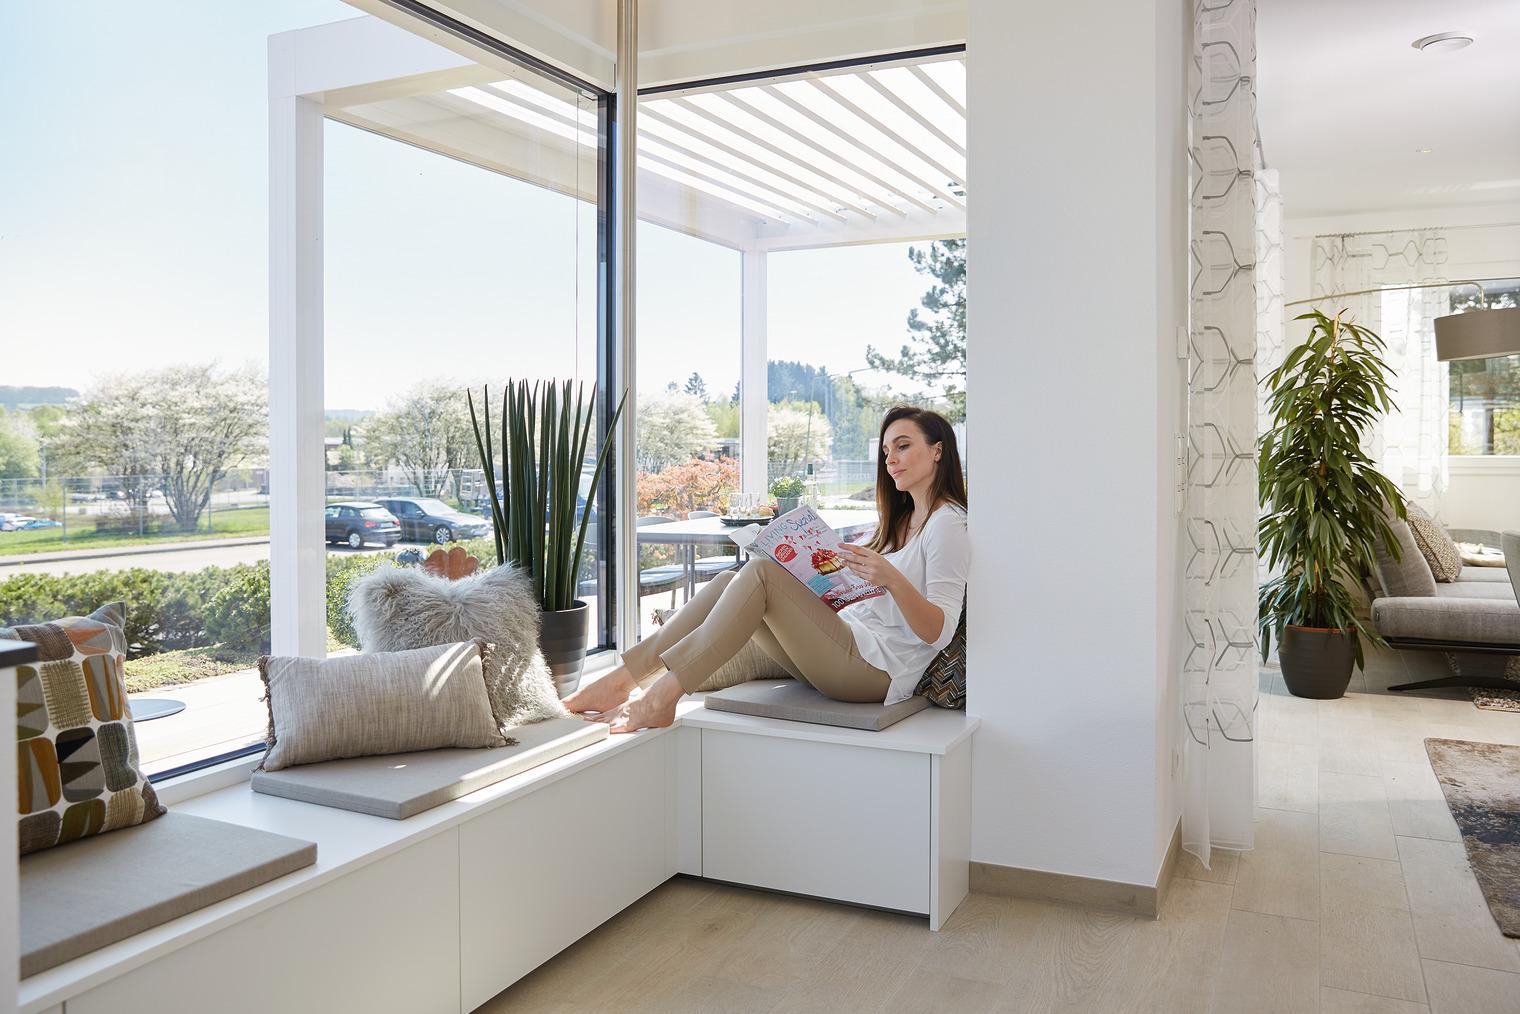 Eckverglasung mit integrierter Fenstersitzbank